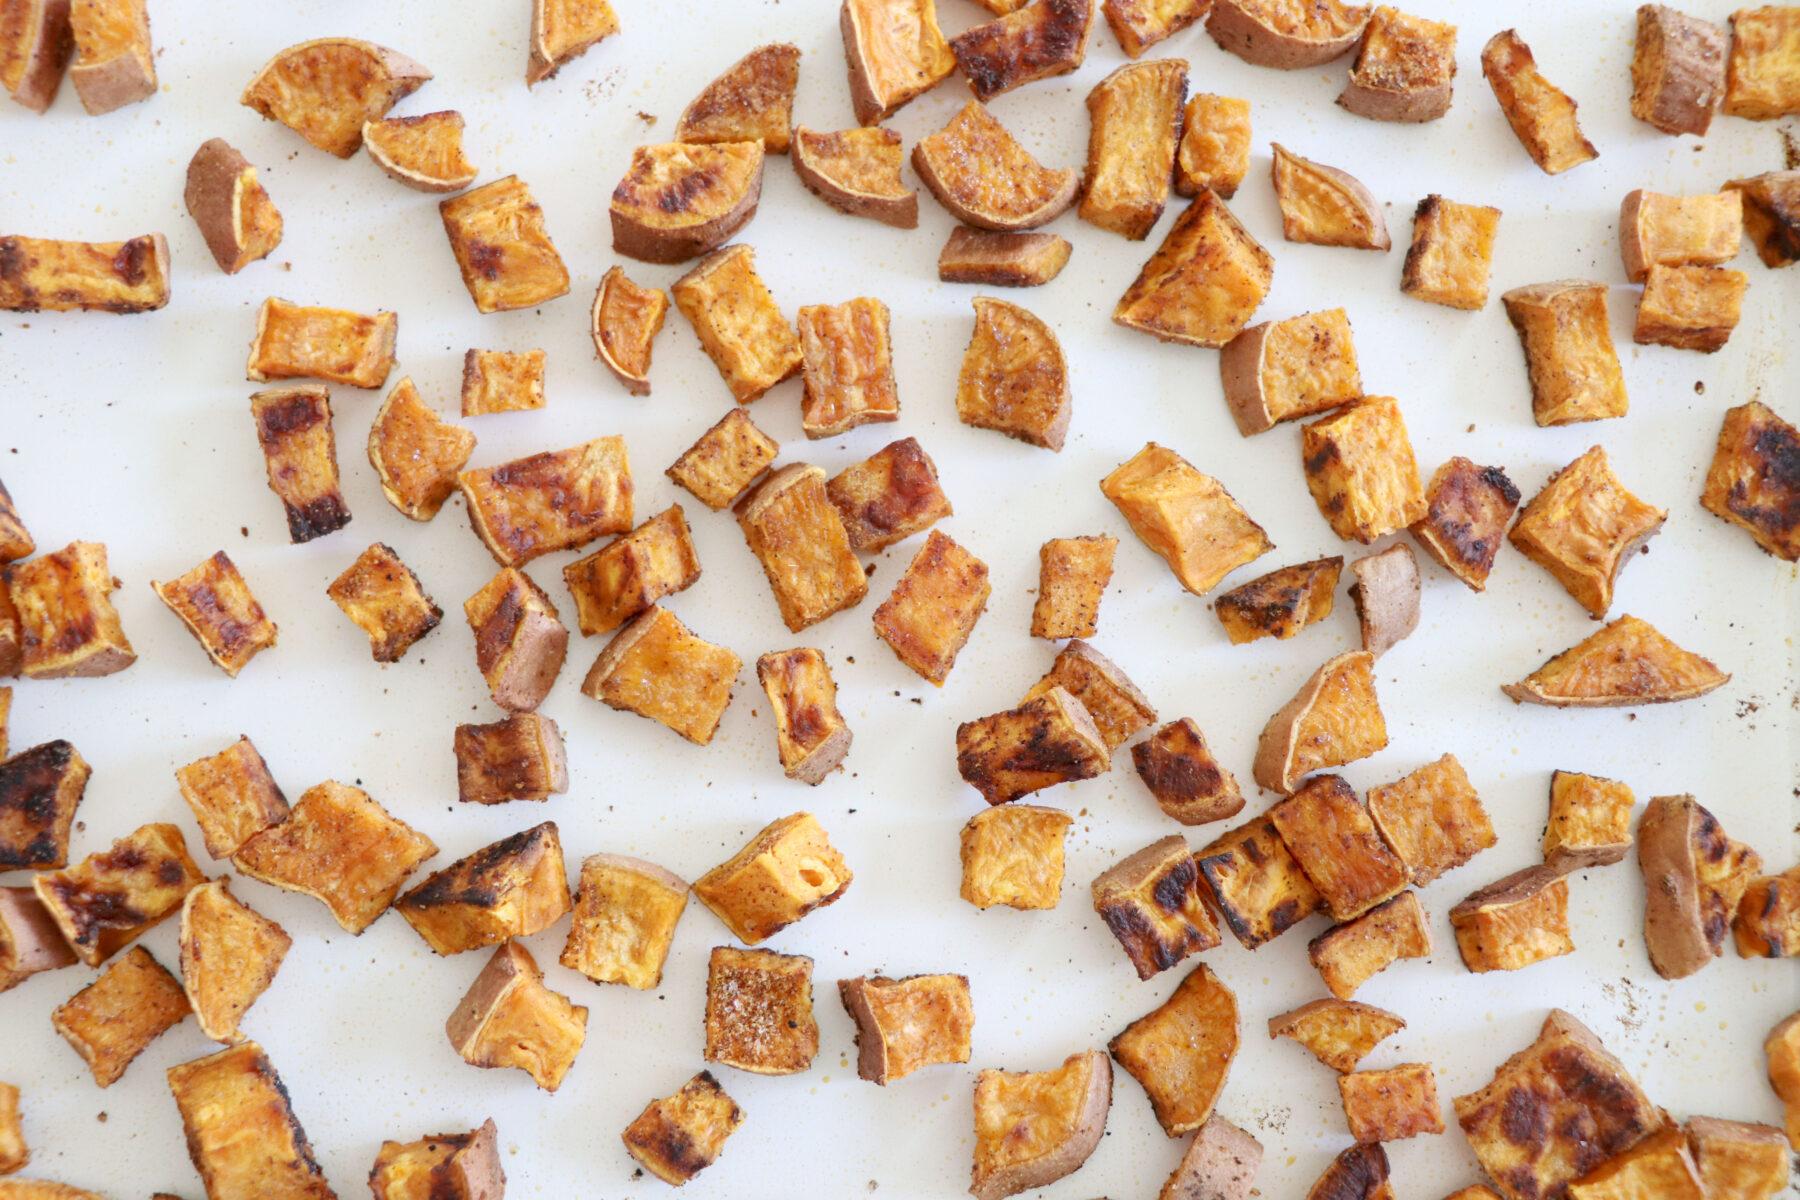 Roasted sweet potatoes on a white baking sheet